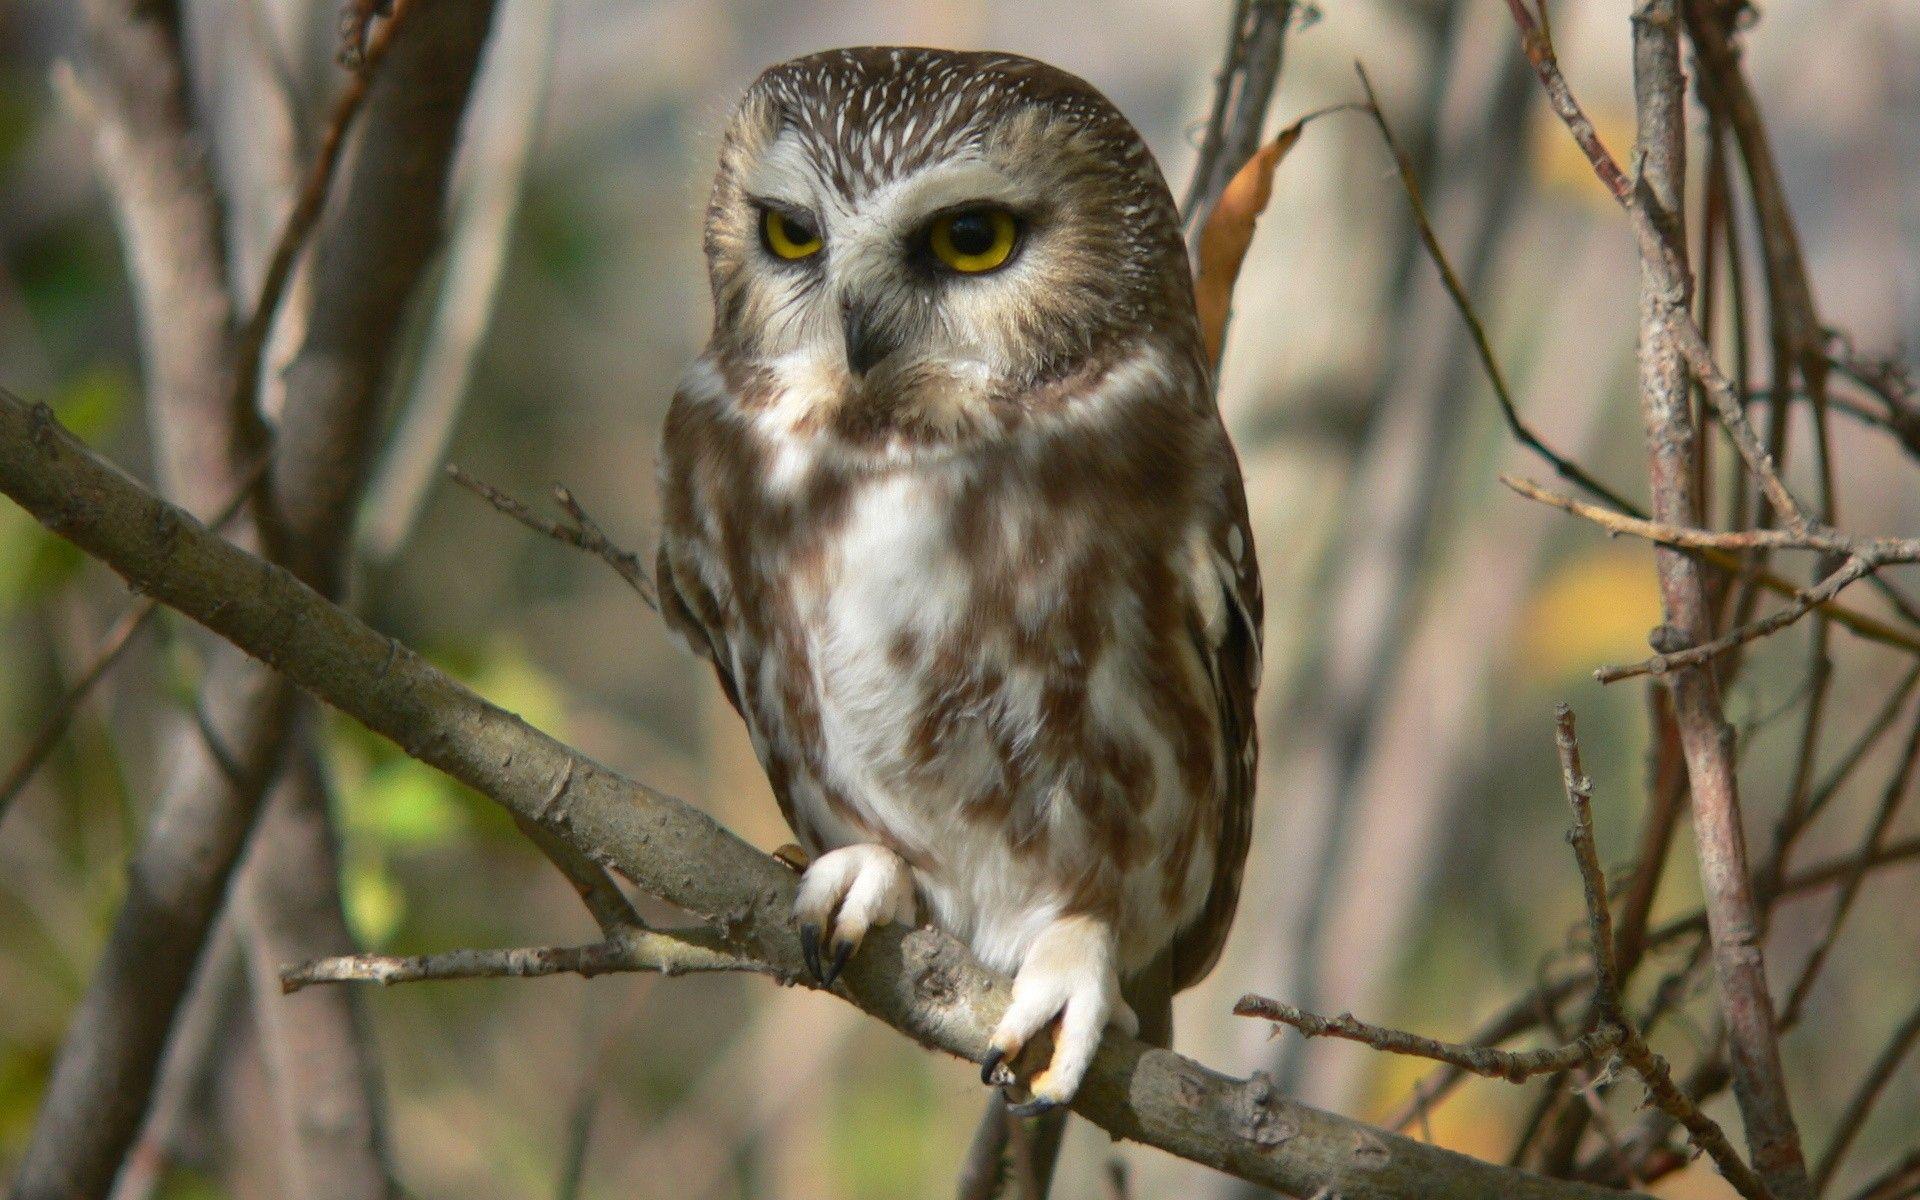 Birds Owls 00425238 Wallpapers HD 1080p